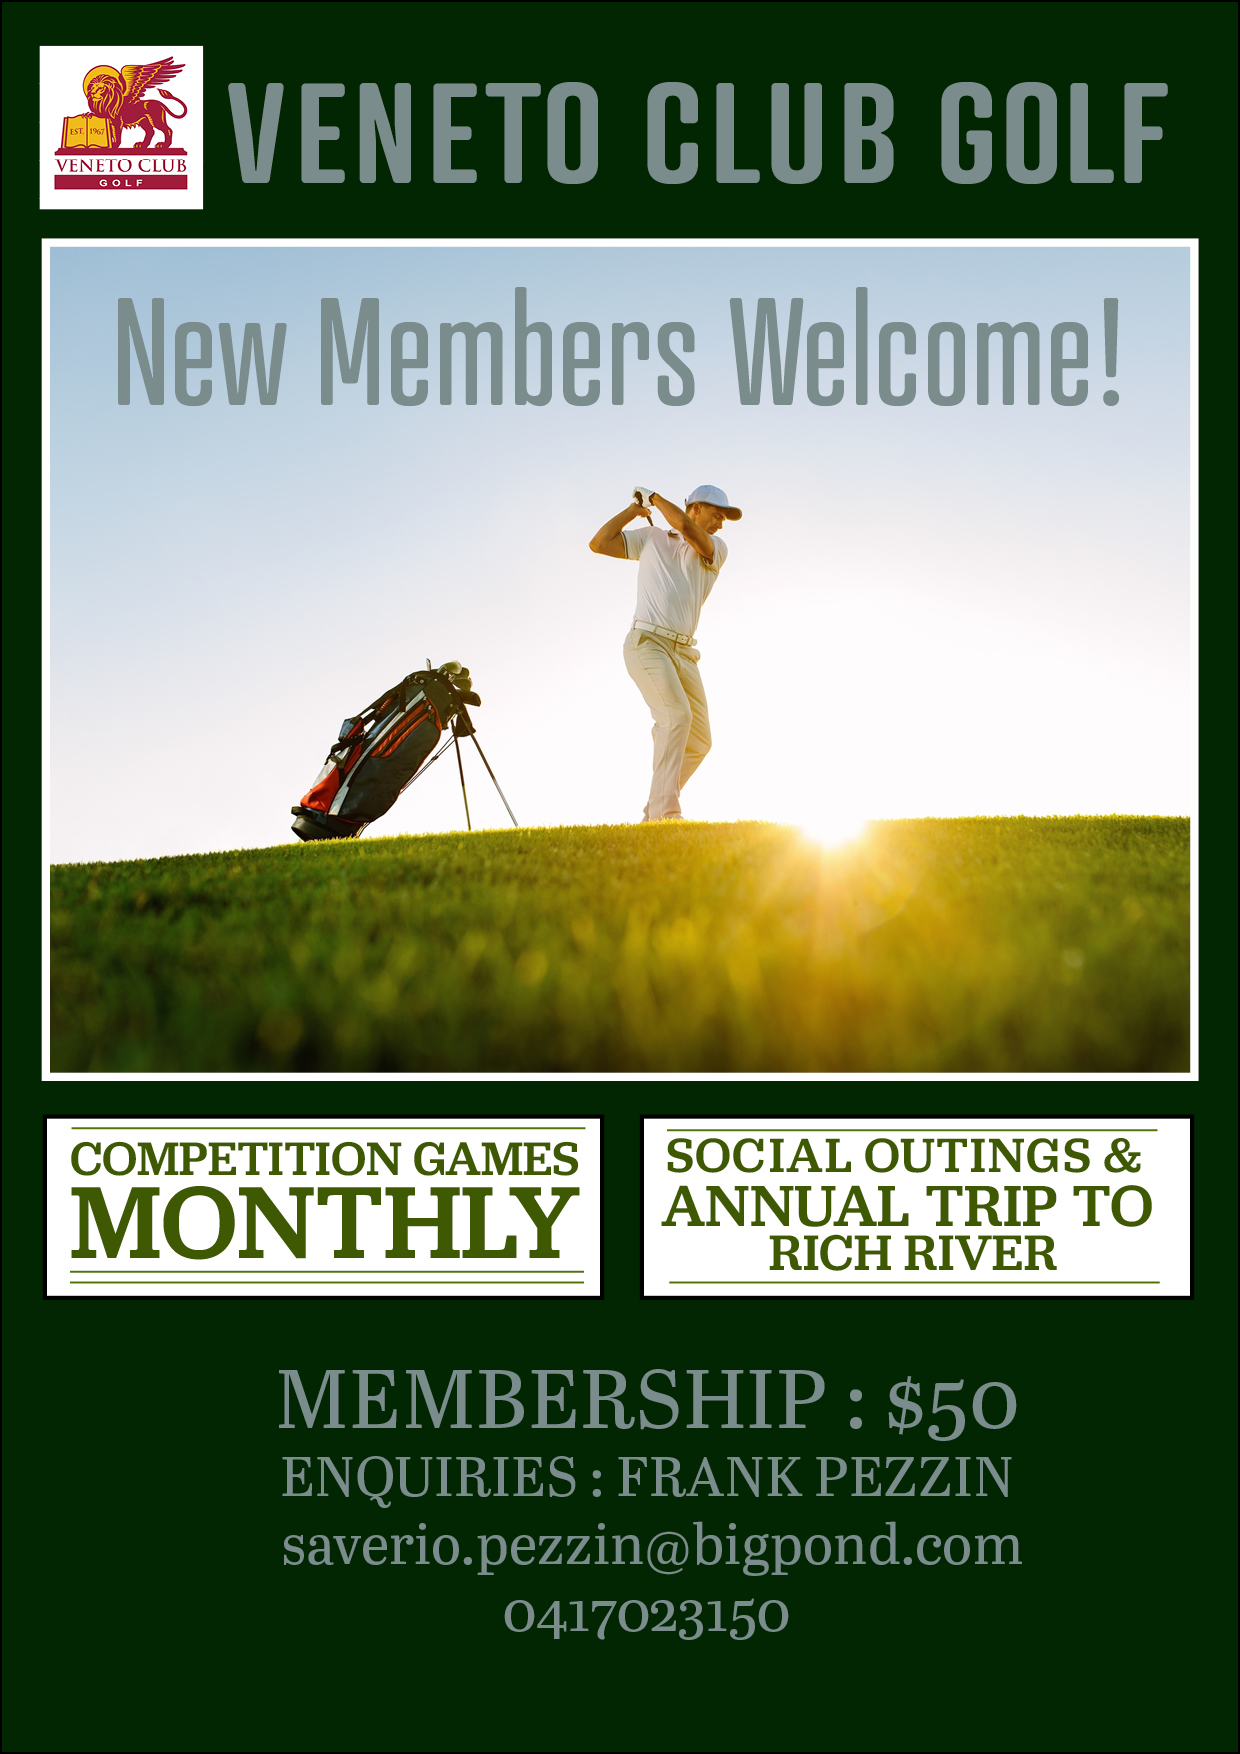 Veneto Club Golf Ad FINAL.jpg